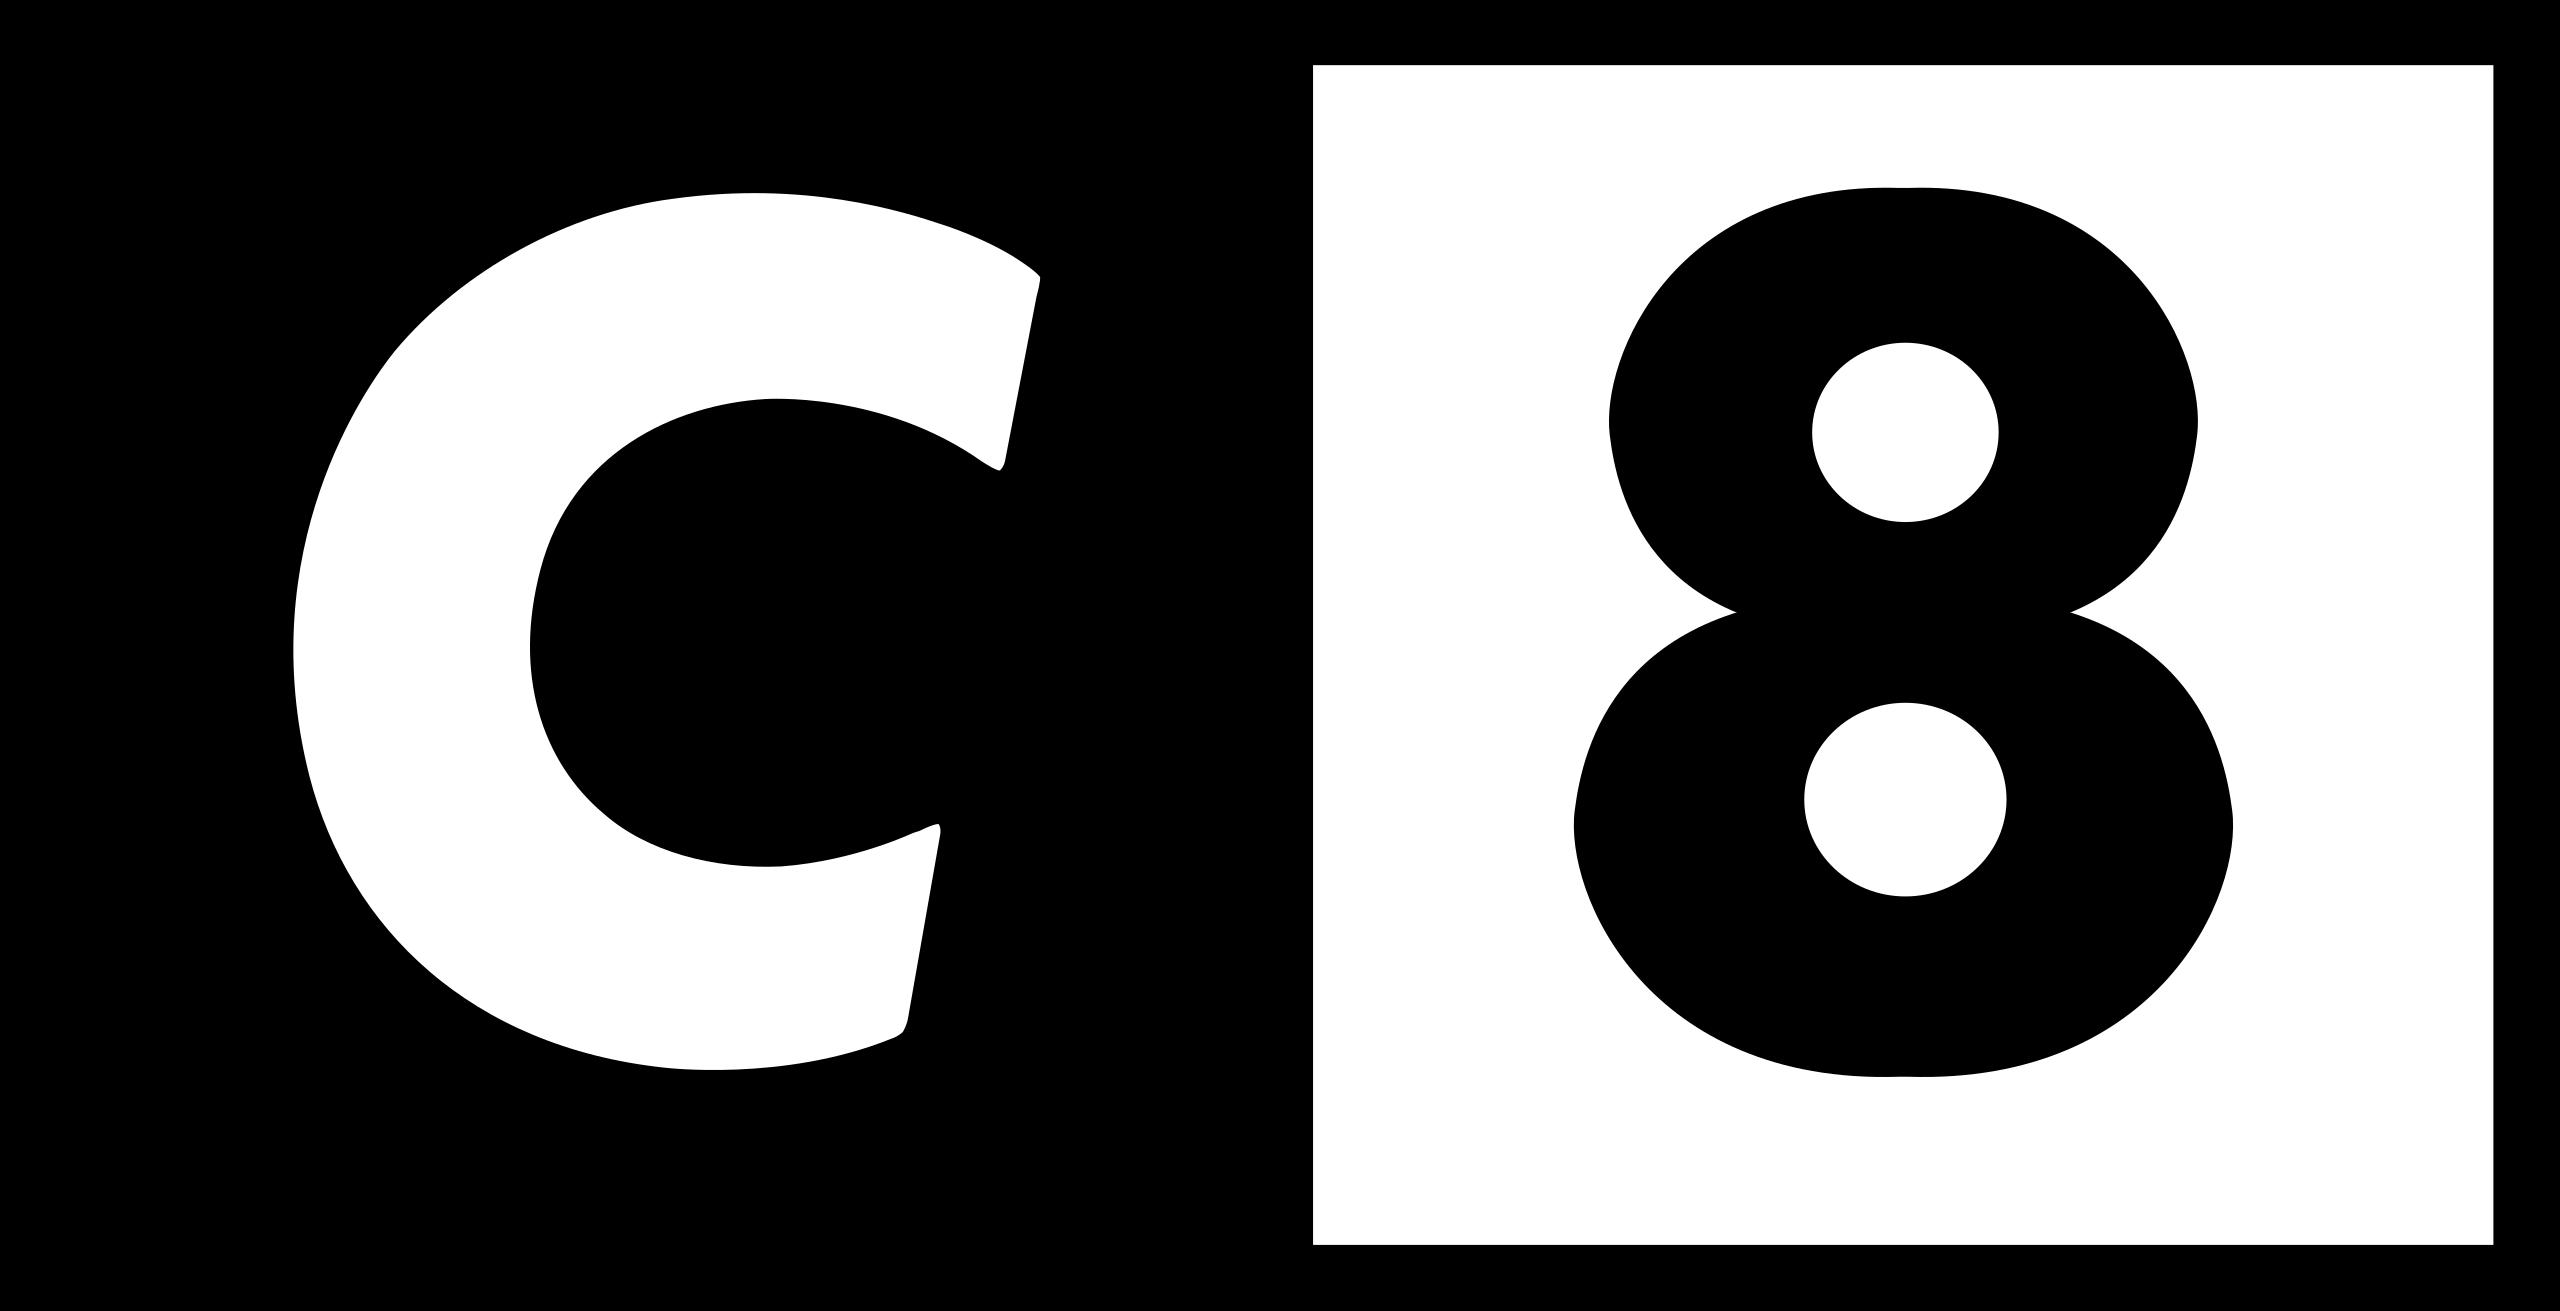 c8.png (30 KB)